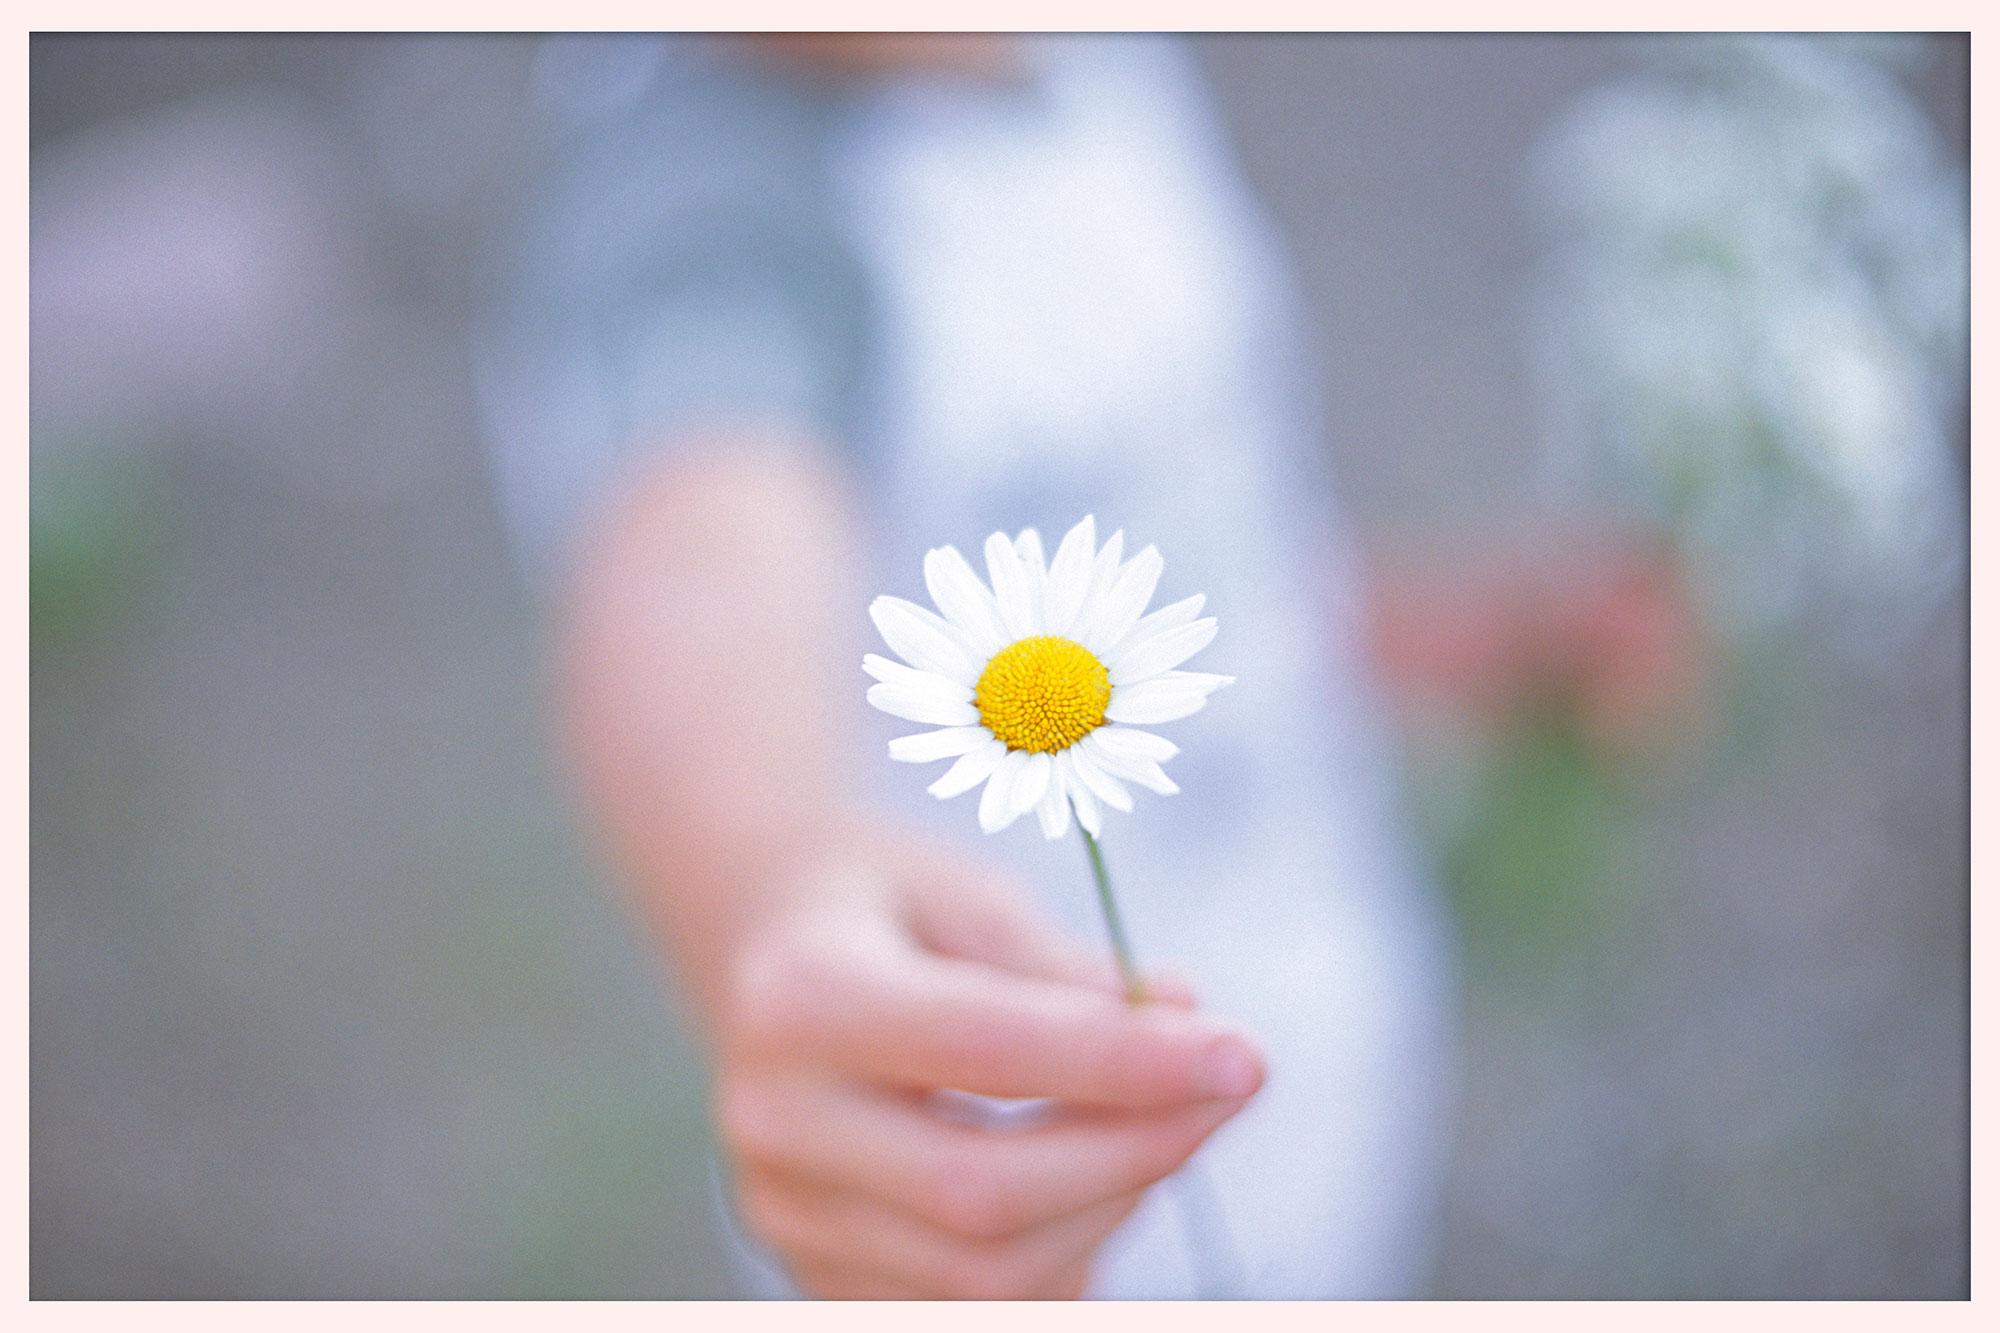 My nephew holding a fresh picked daisy. © 2005.